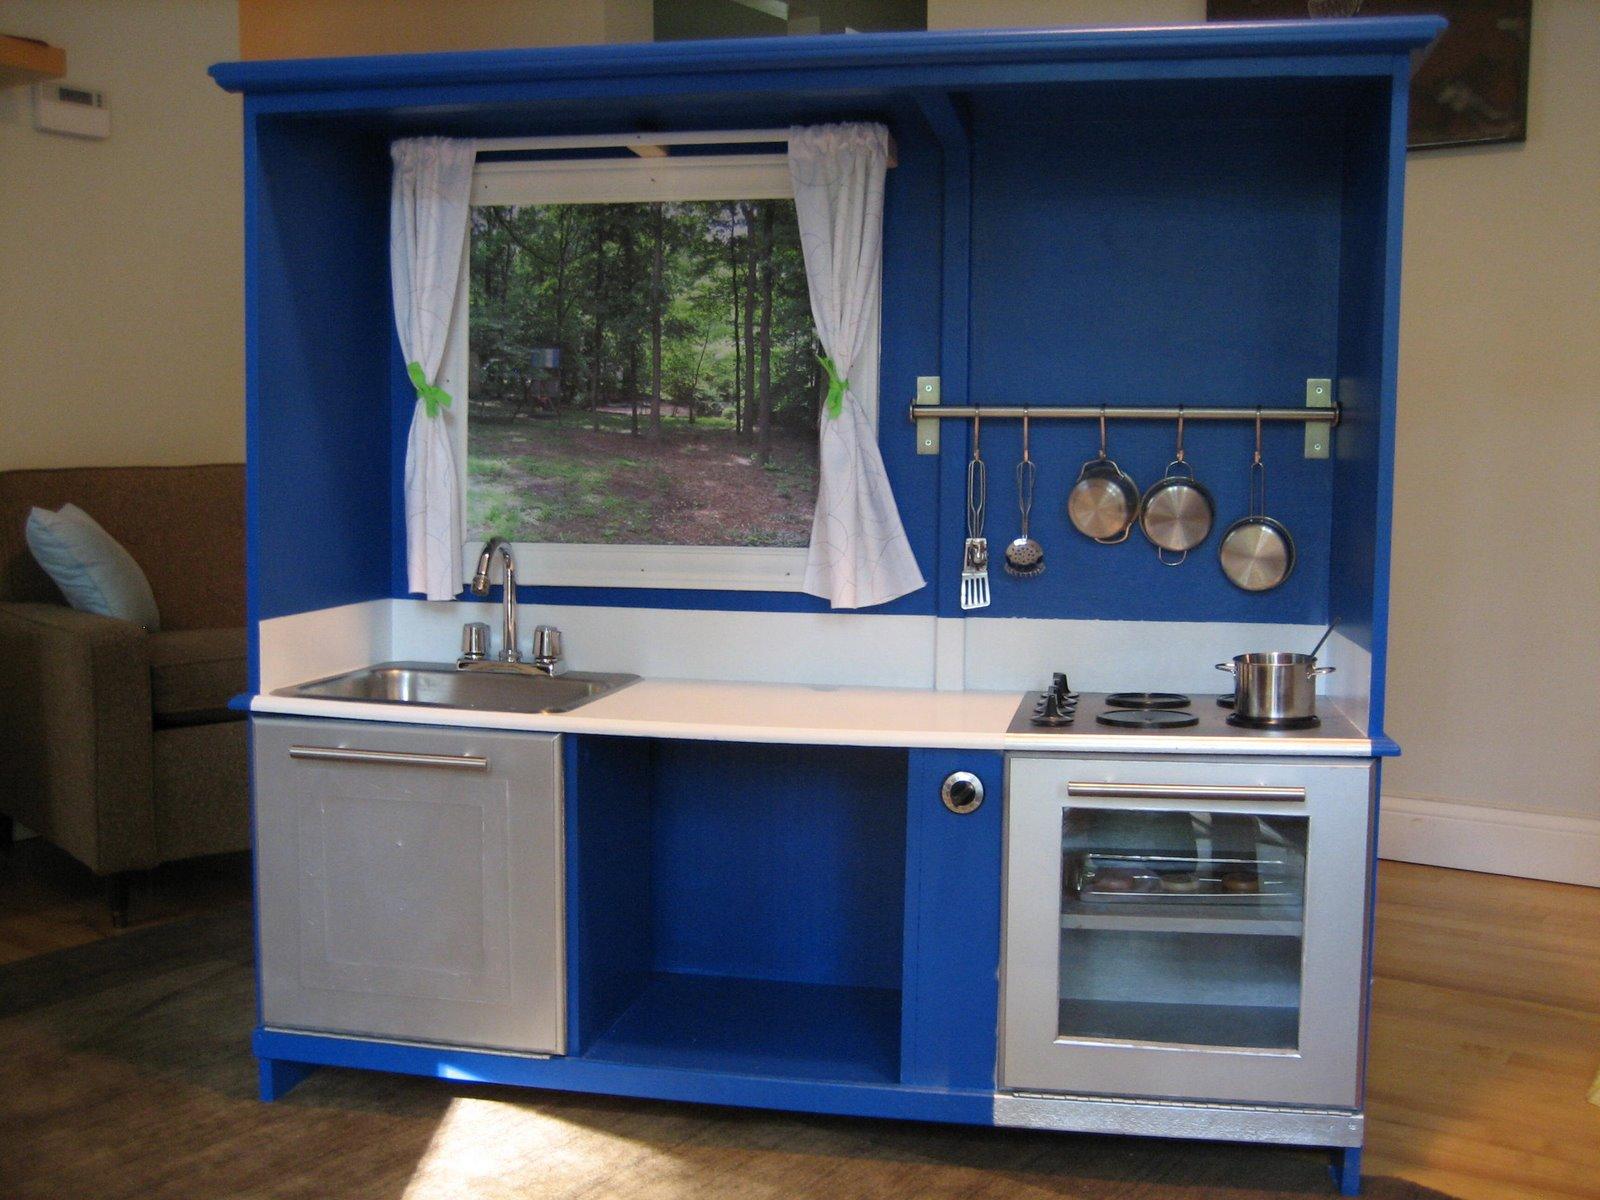 Regifter Bible Entertainment Center Turned Play Kitchen